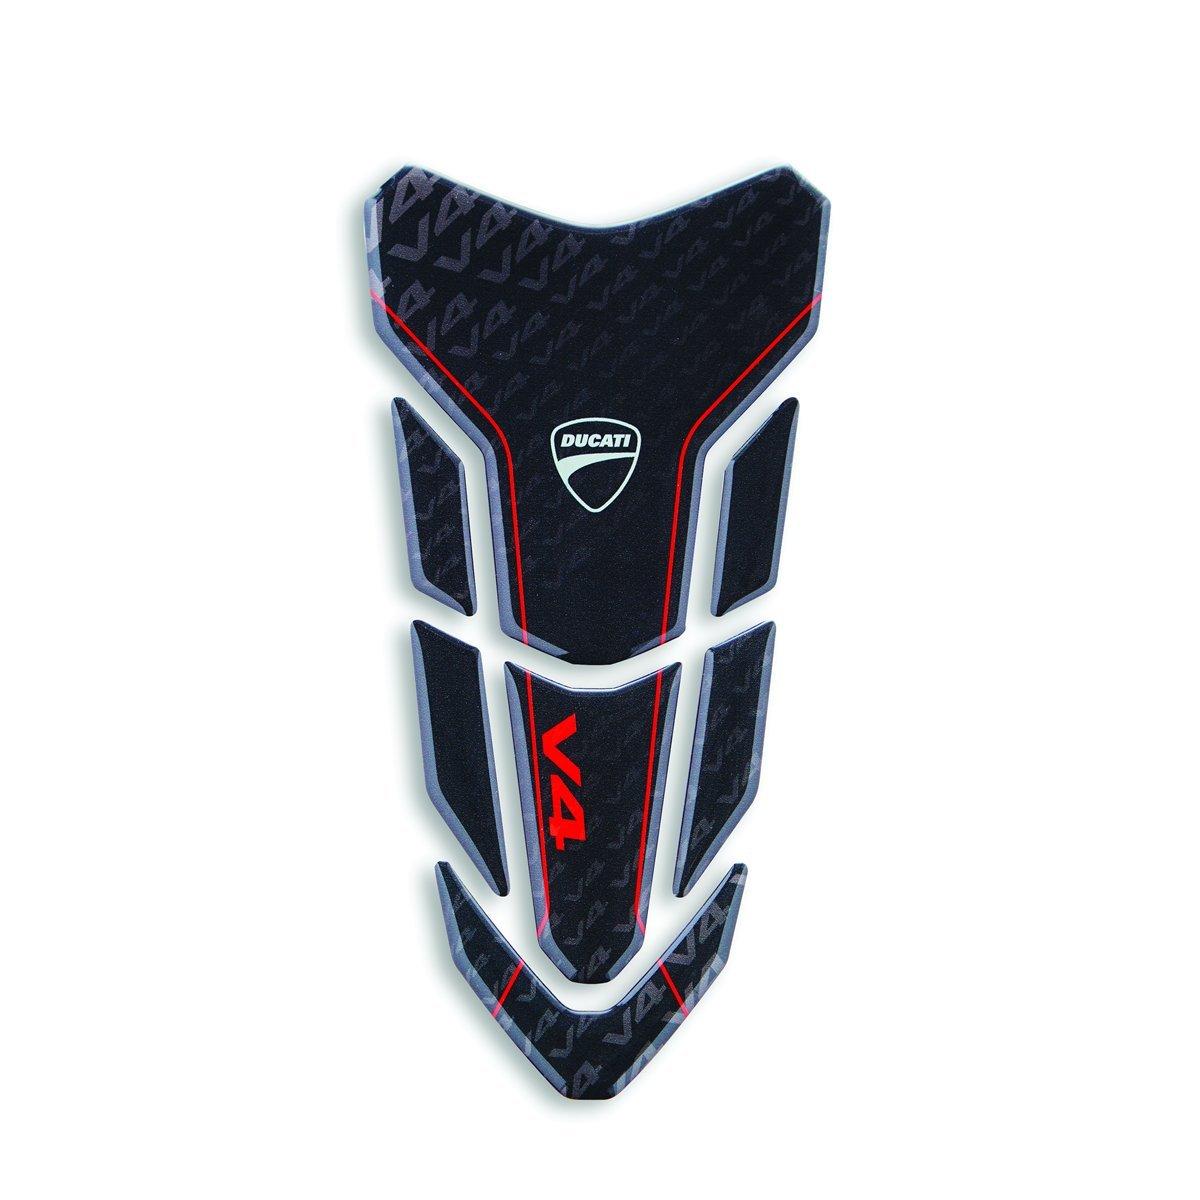 Ducati V4 V4 black adhesive tank protection. 97480171A